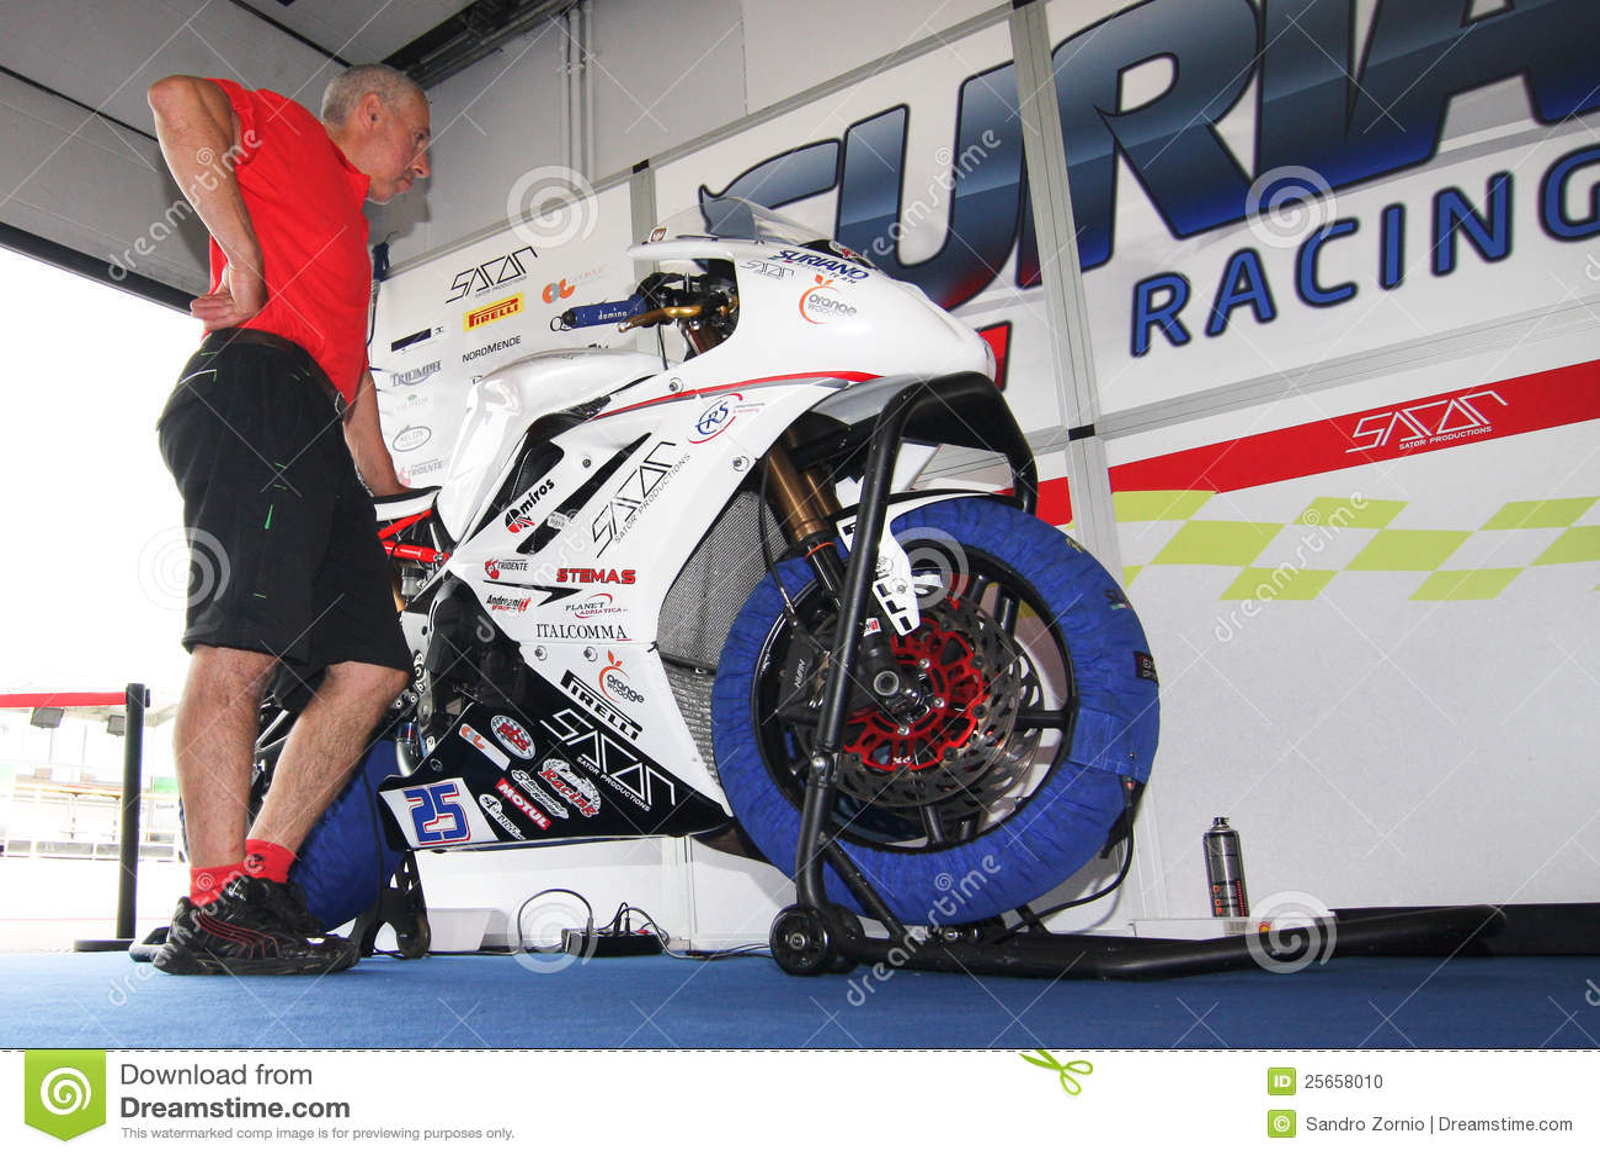 Triumph Daytona 675 Power team by Suriano